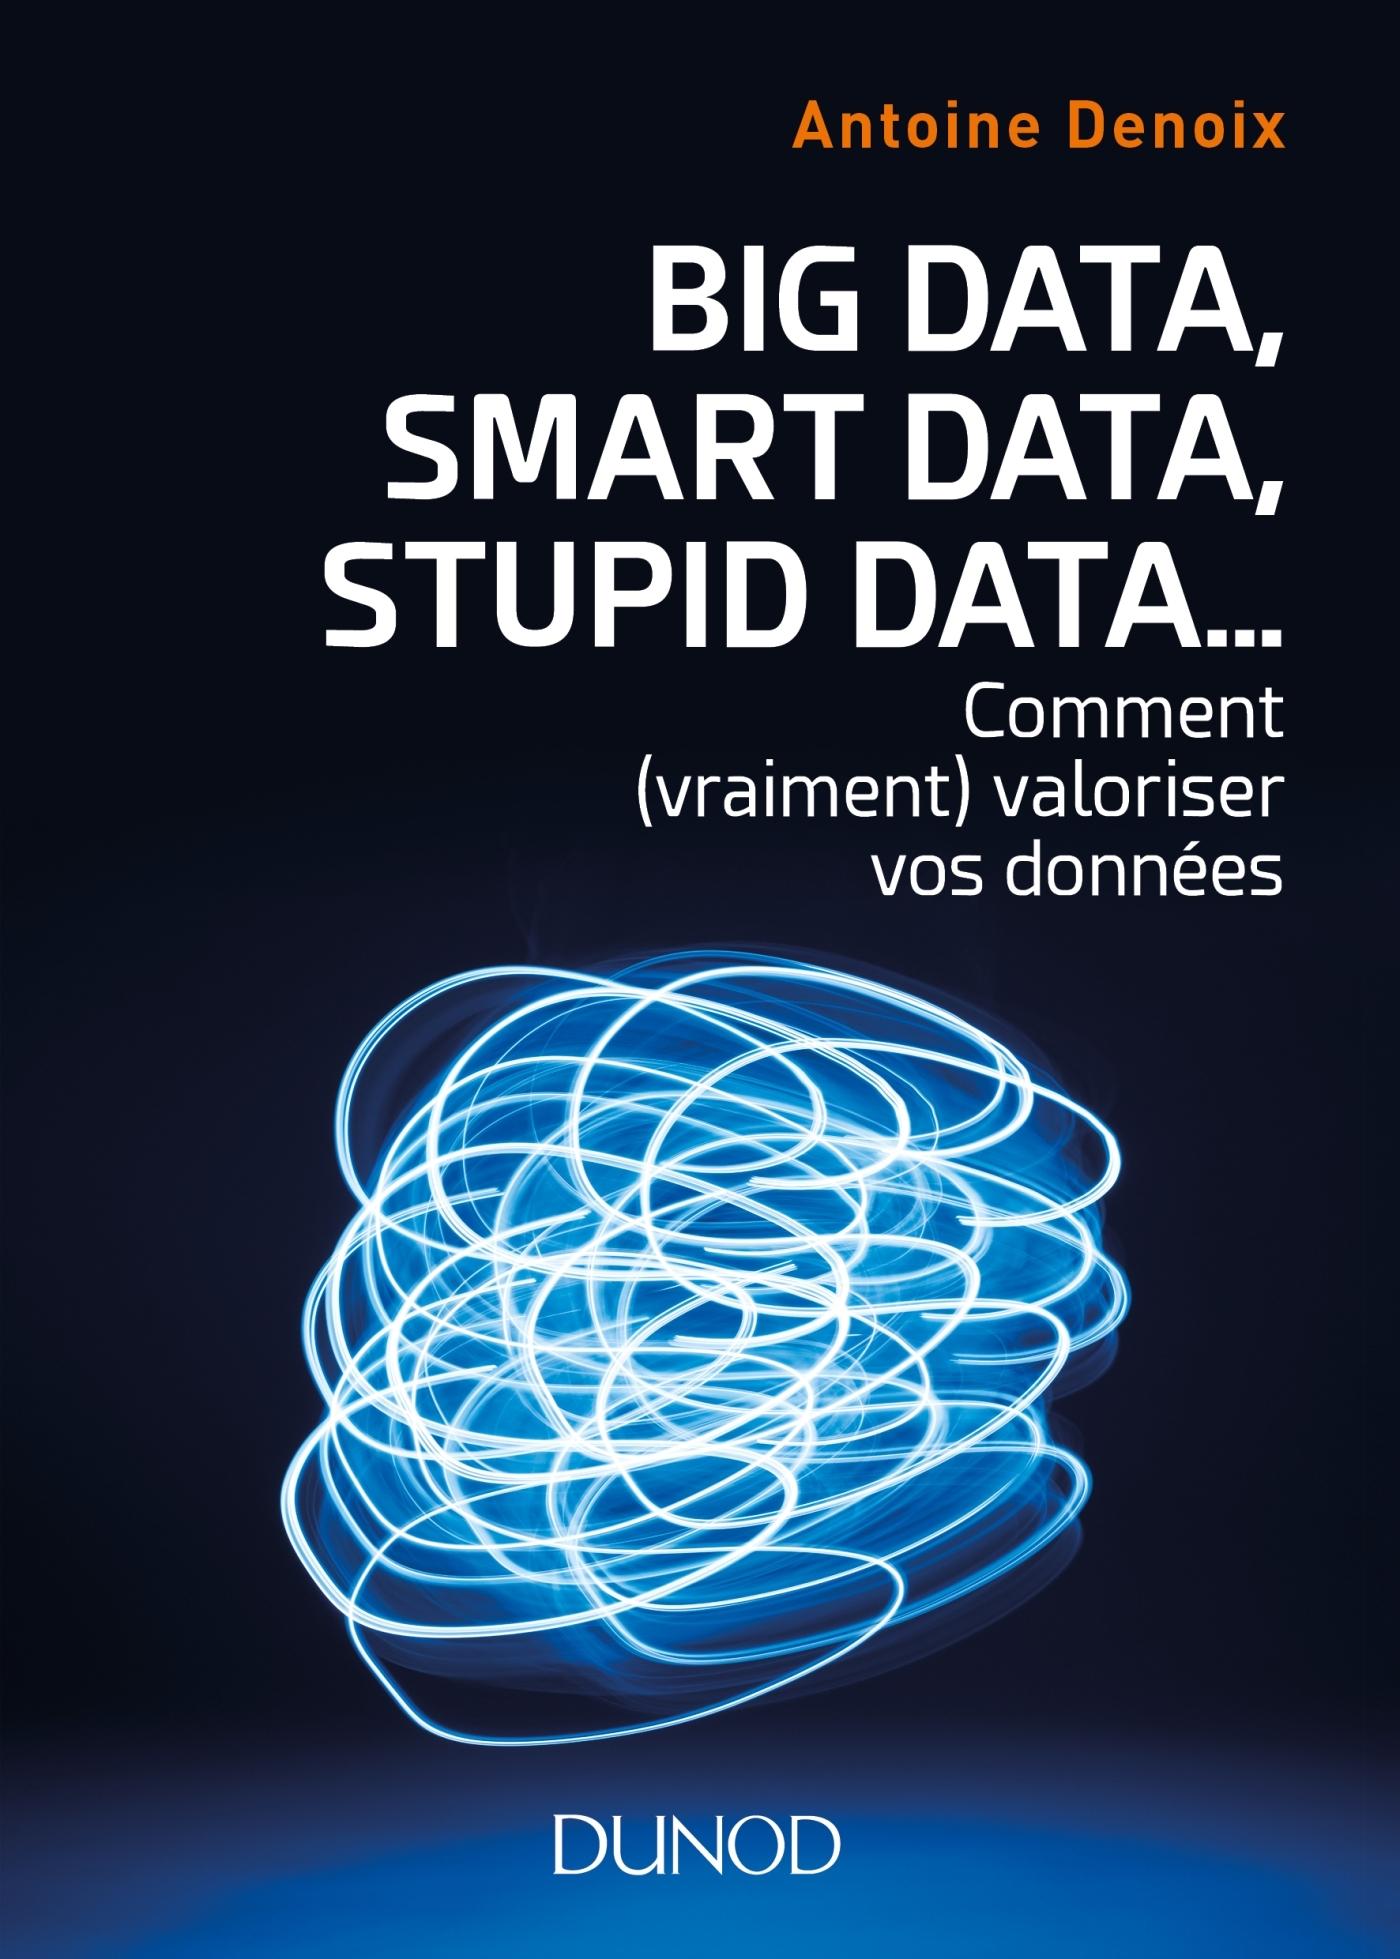 BIG DATA, SMART DATA, STUPID DATA... COMMENT (VRAIMENT) VALORISER VOS DONNEES